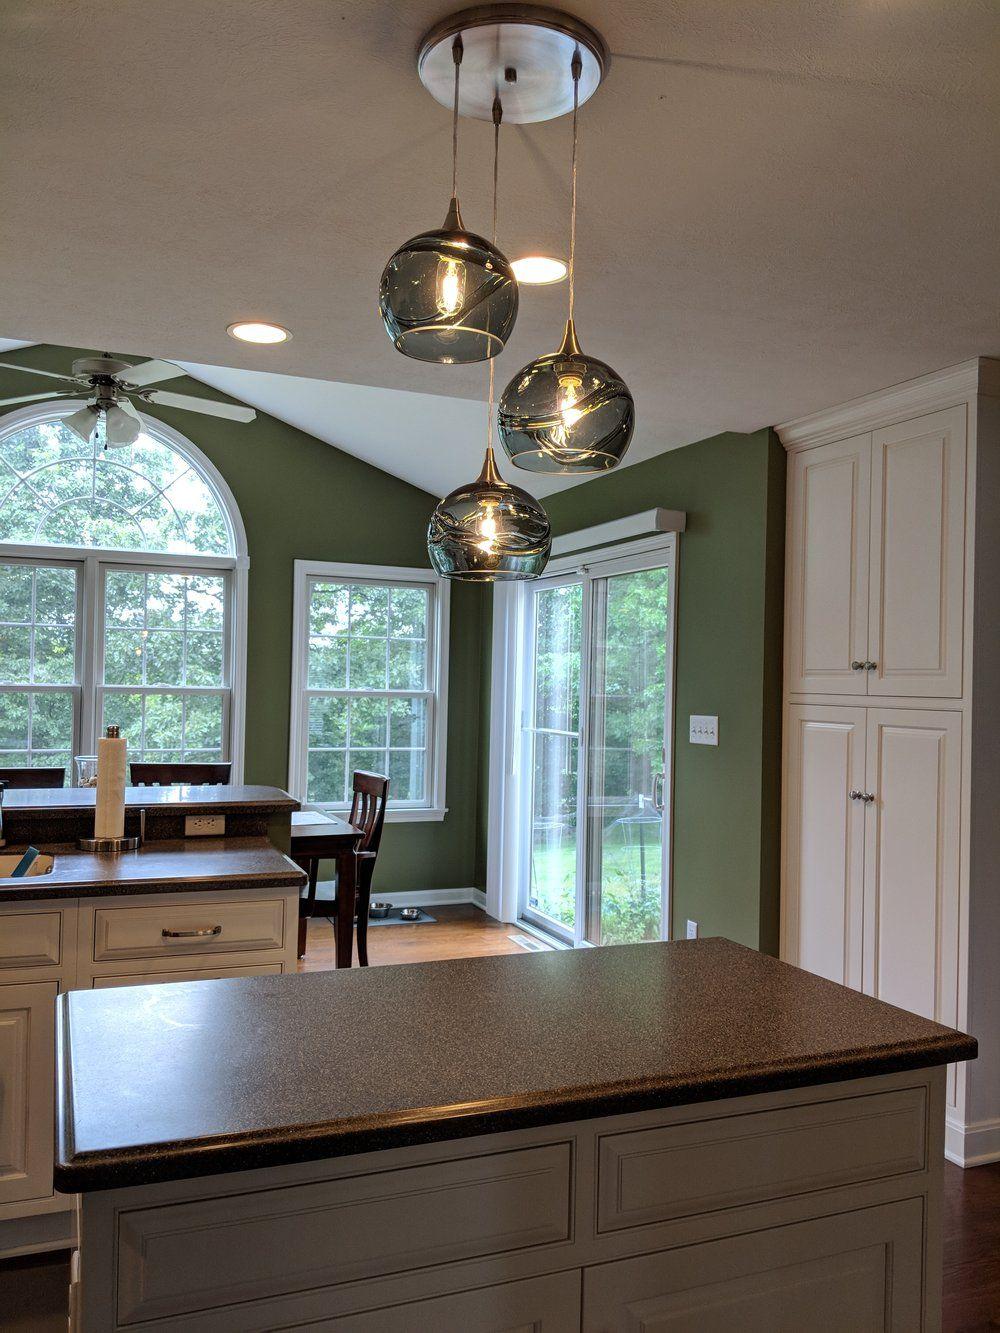 Kitchen window molding  swell  pendant cascade chandelier  design no   home renewal